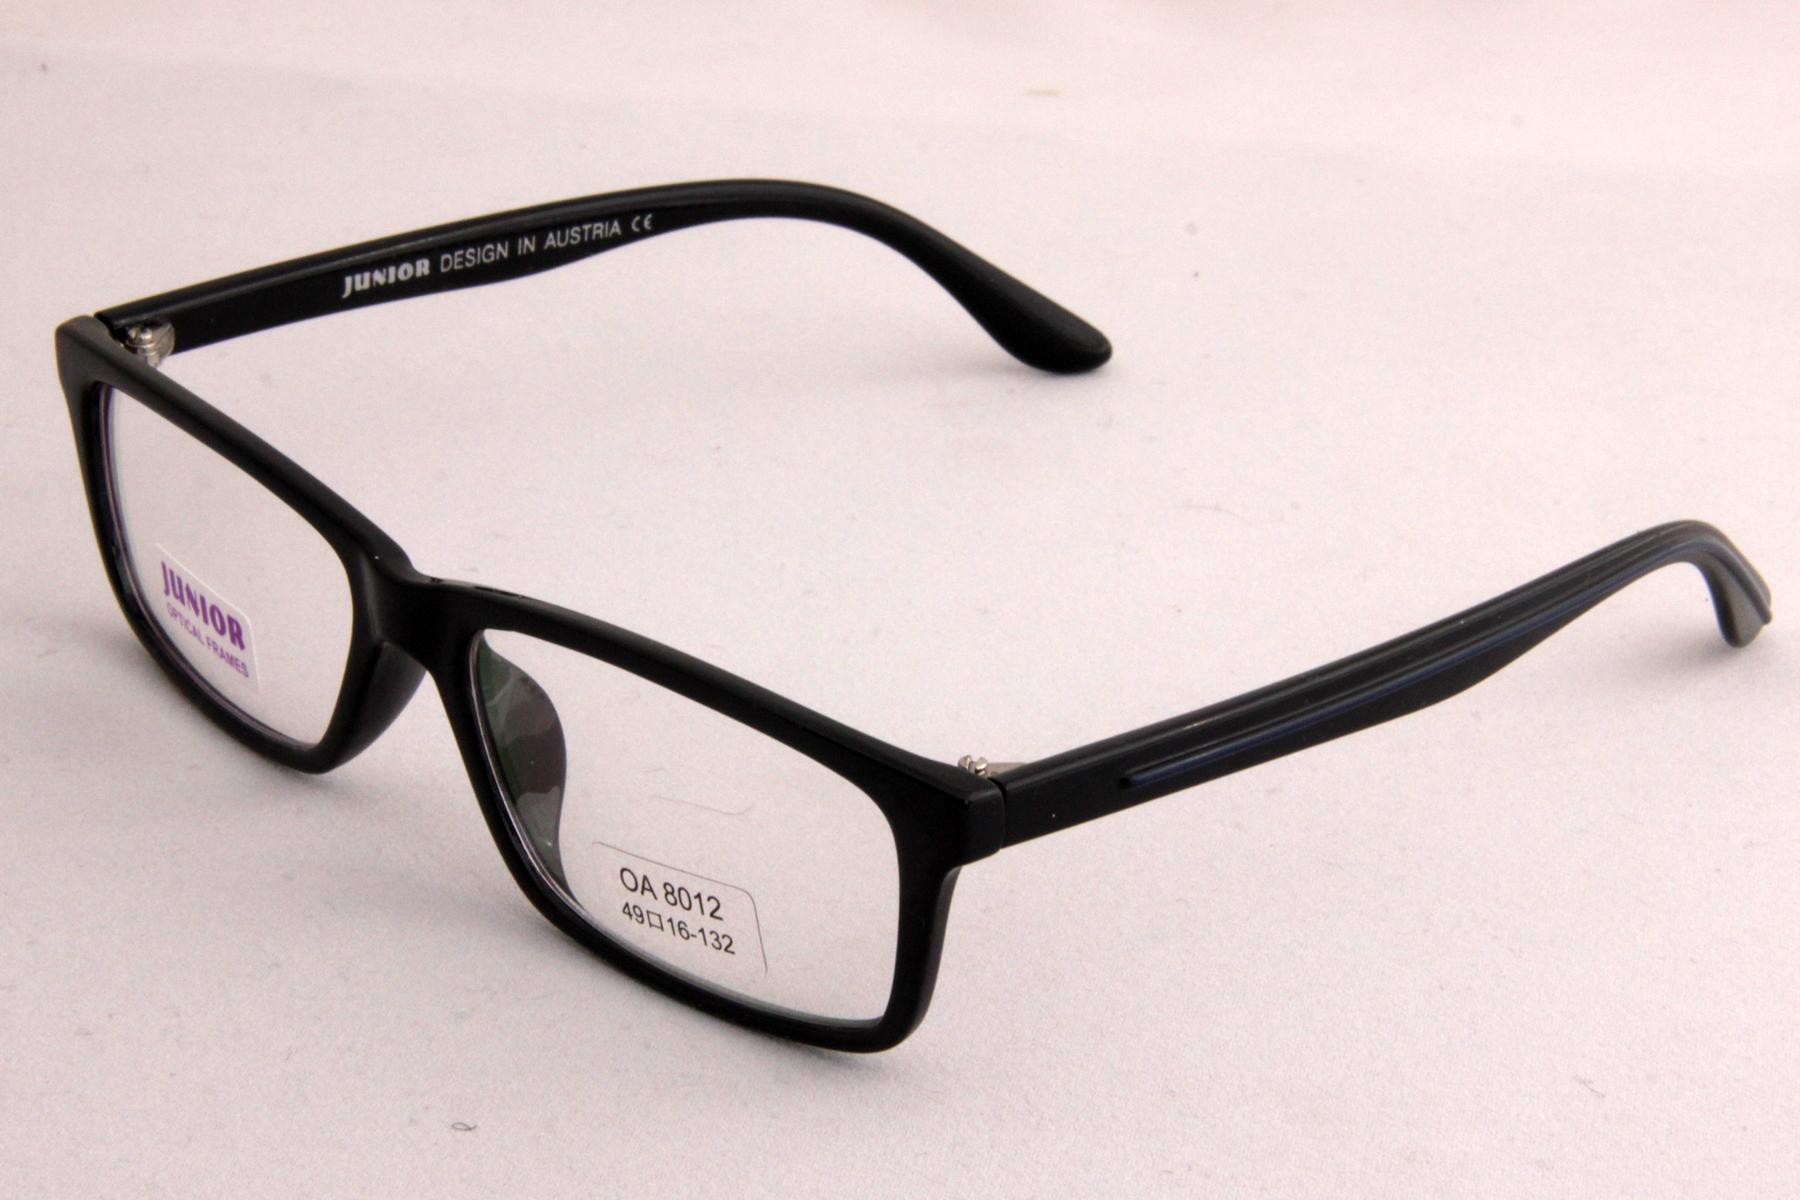 Eyeglasses Frames For Toddlers : Spectacle and Eyewear Frame(Junior)In Black Full Rim For ...